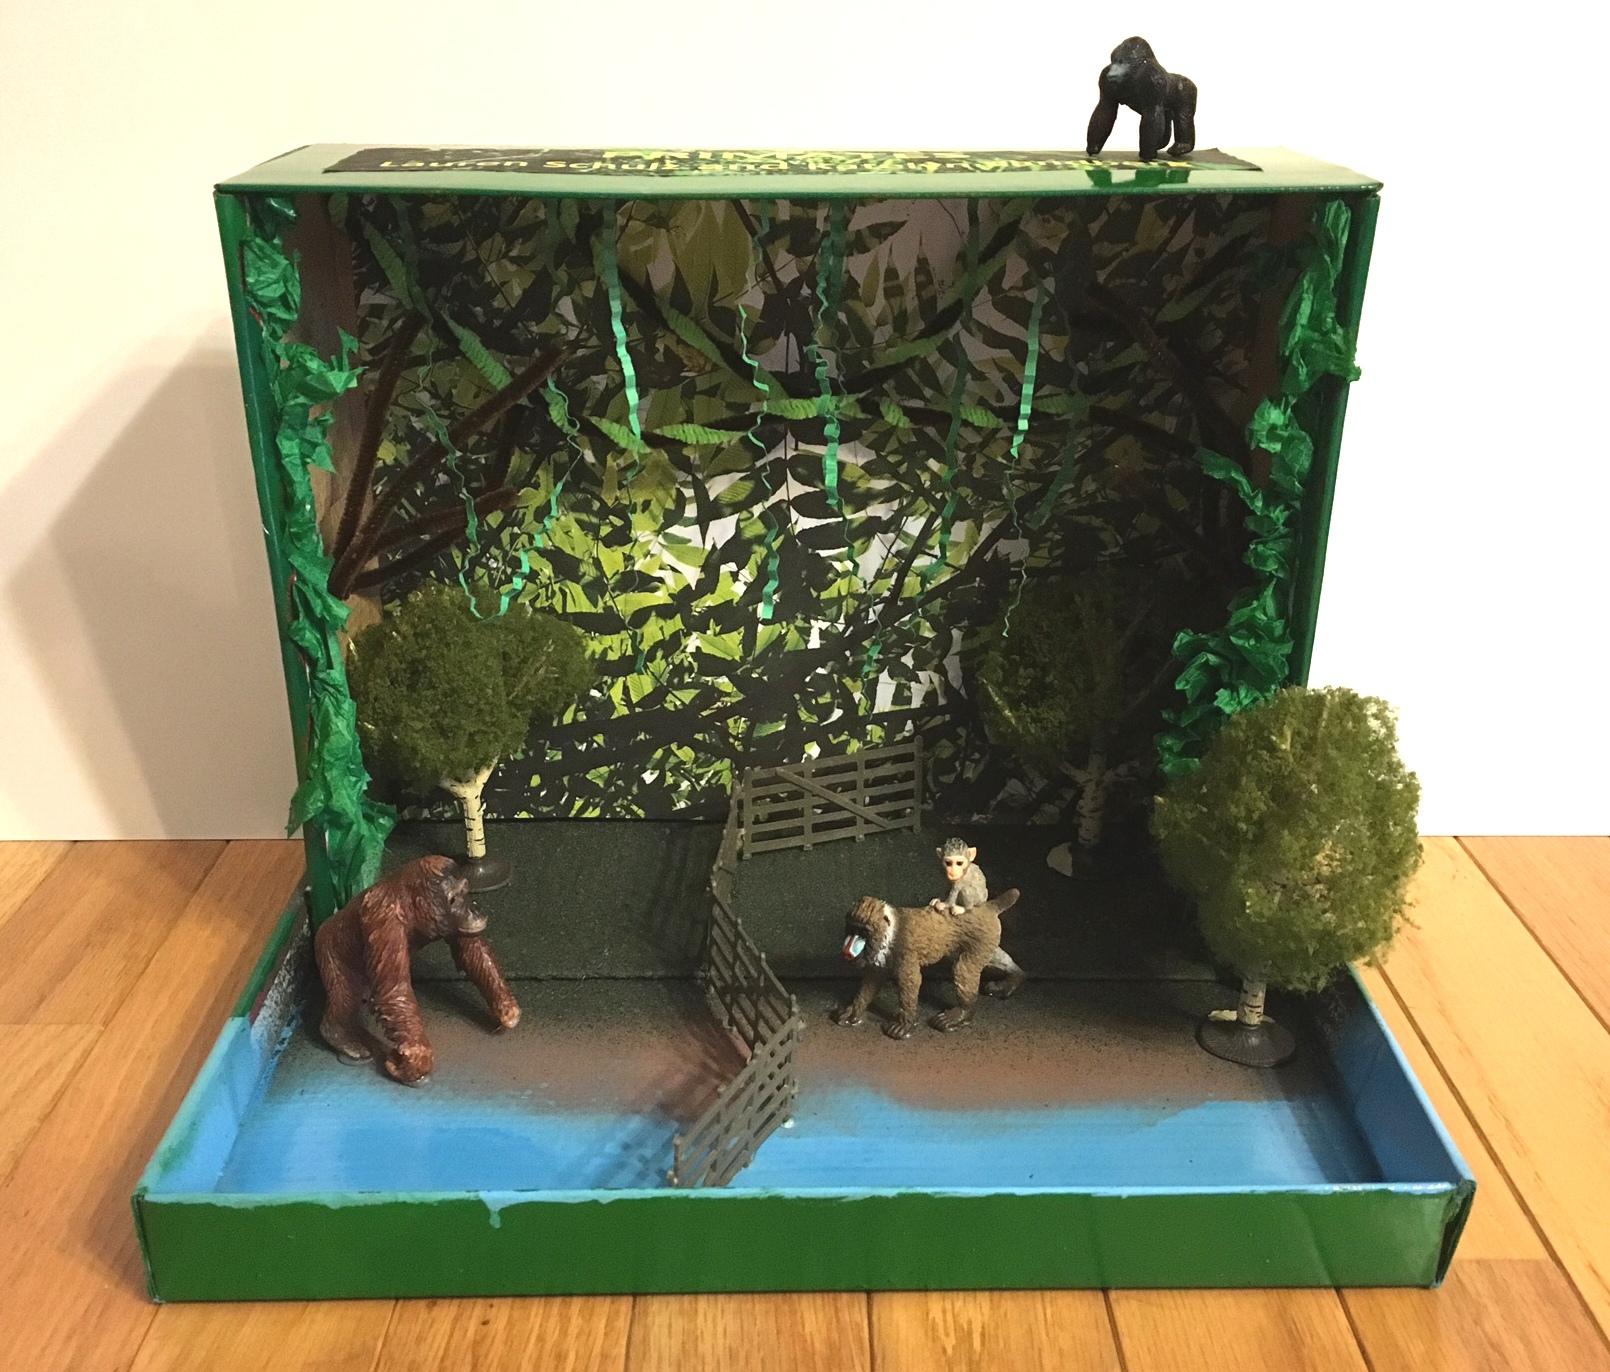 Primate Animal Habitat Diorama For Science Class